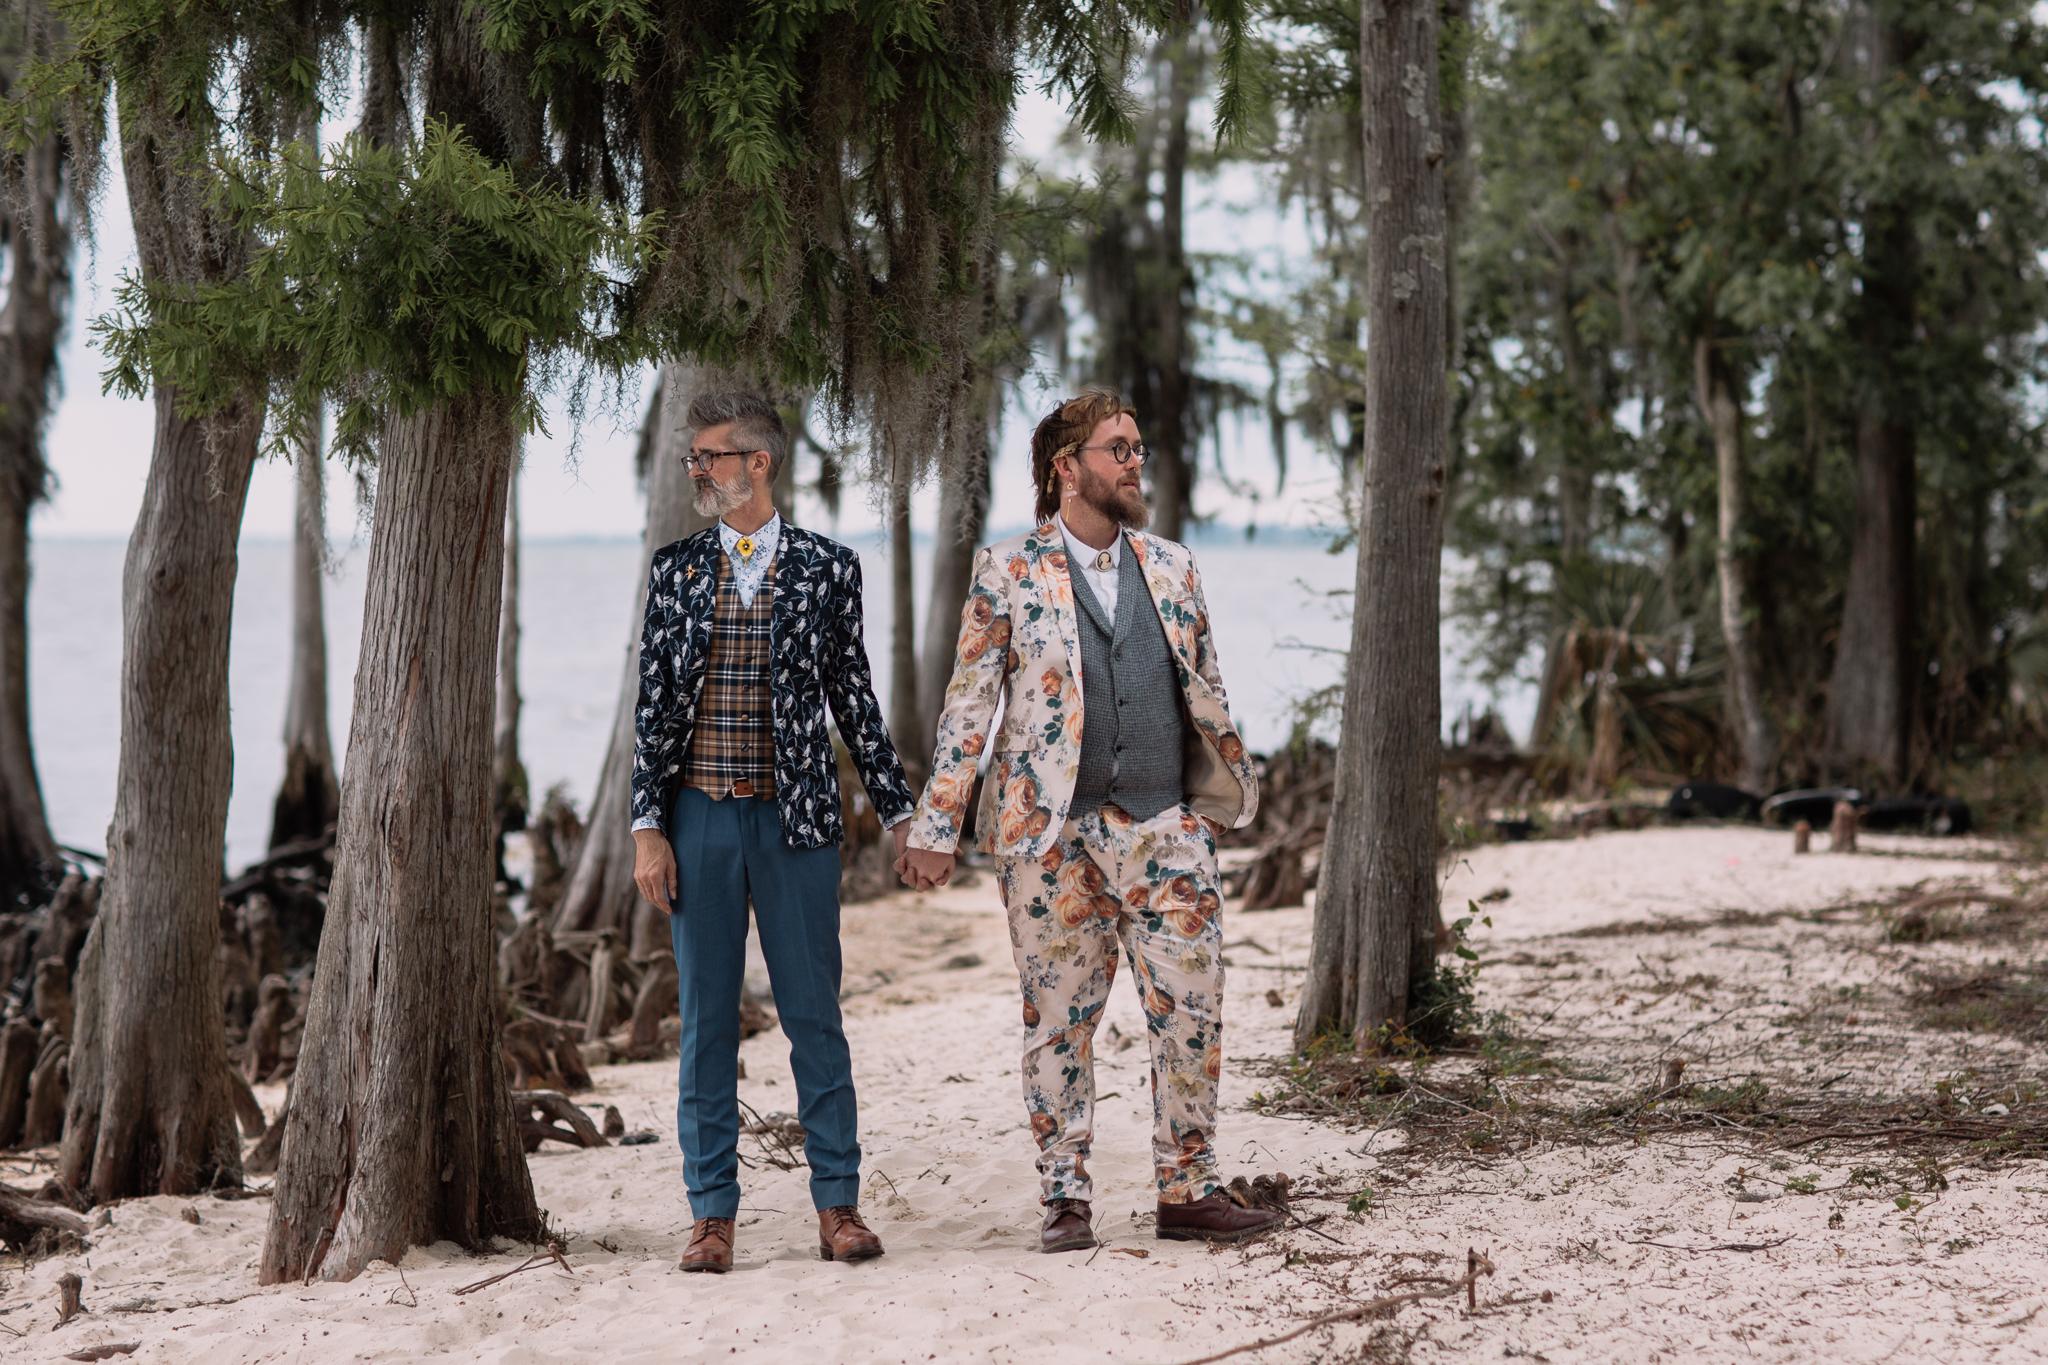 Tim and David - New orleans Wedding - Kallistia Photography-1.jpg